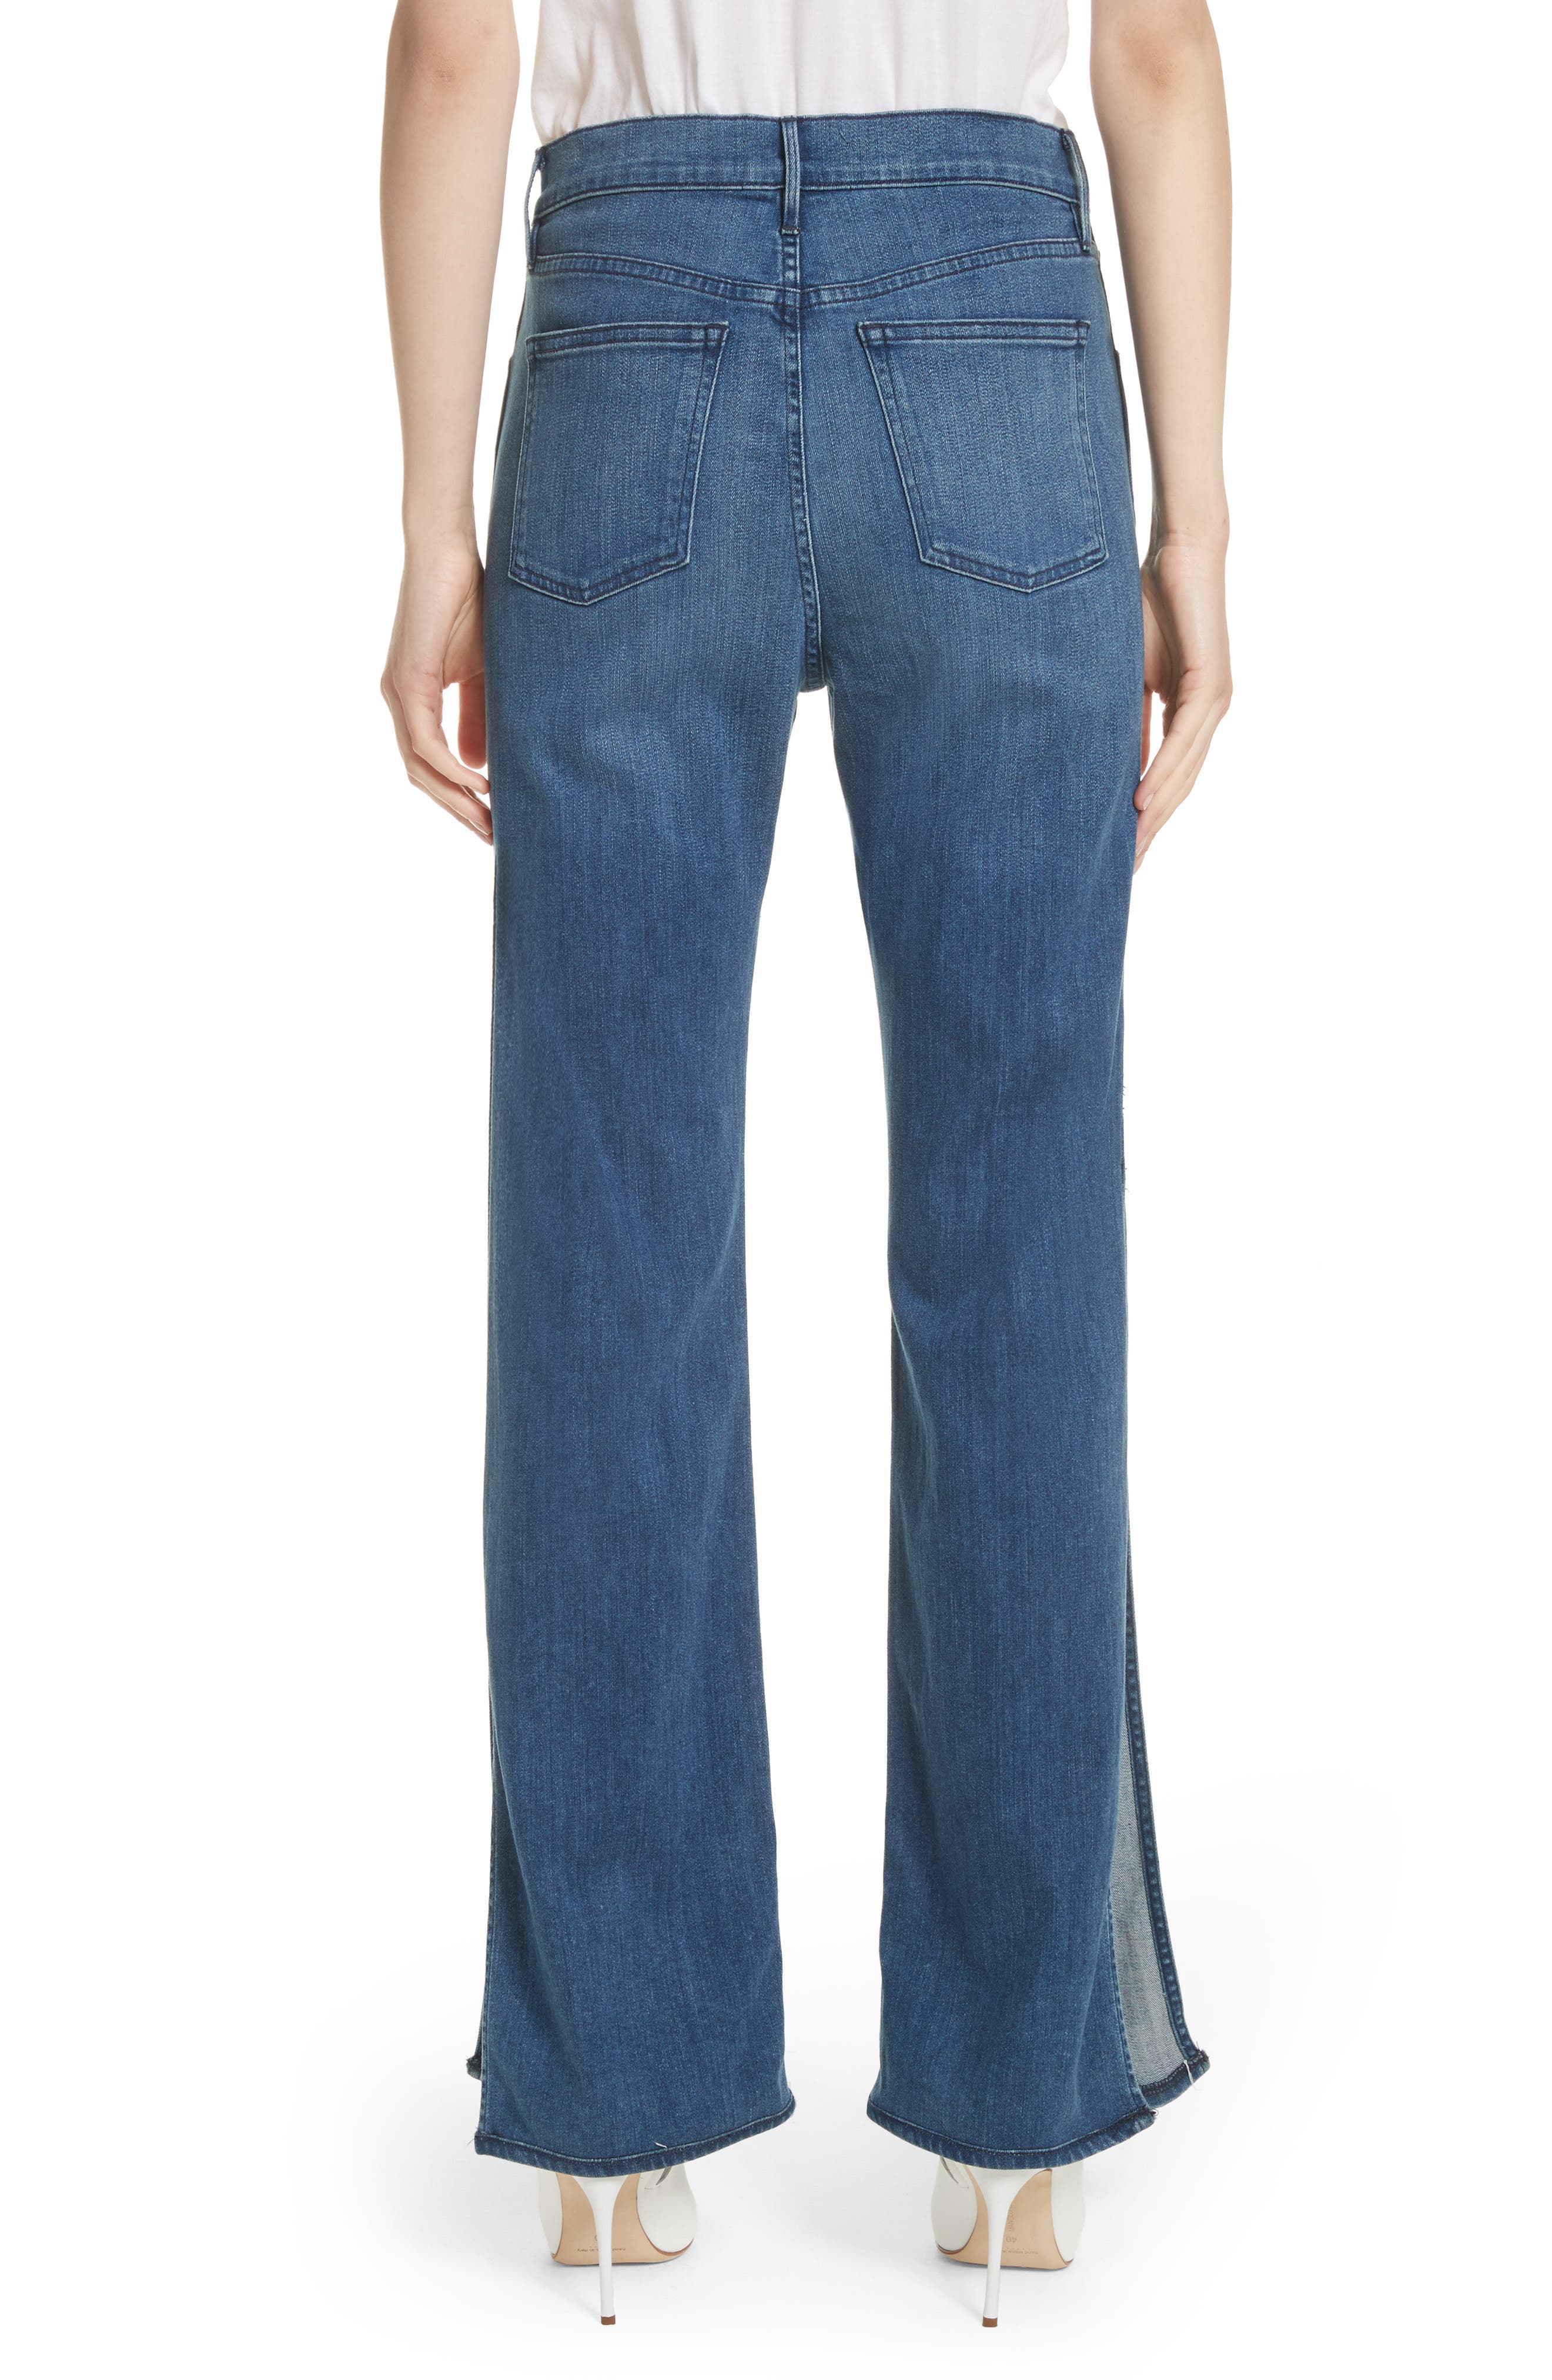 W4 Adeline High Waist Split Flare Jeans,                             Alternate thumbnail 2, color,                             Leia